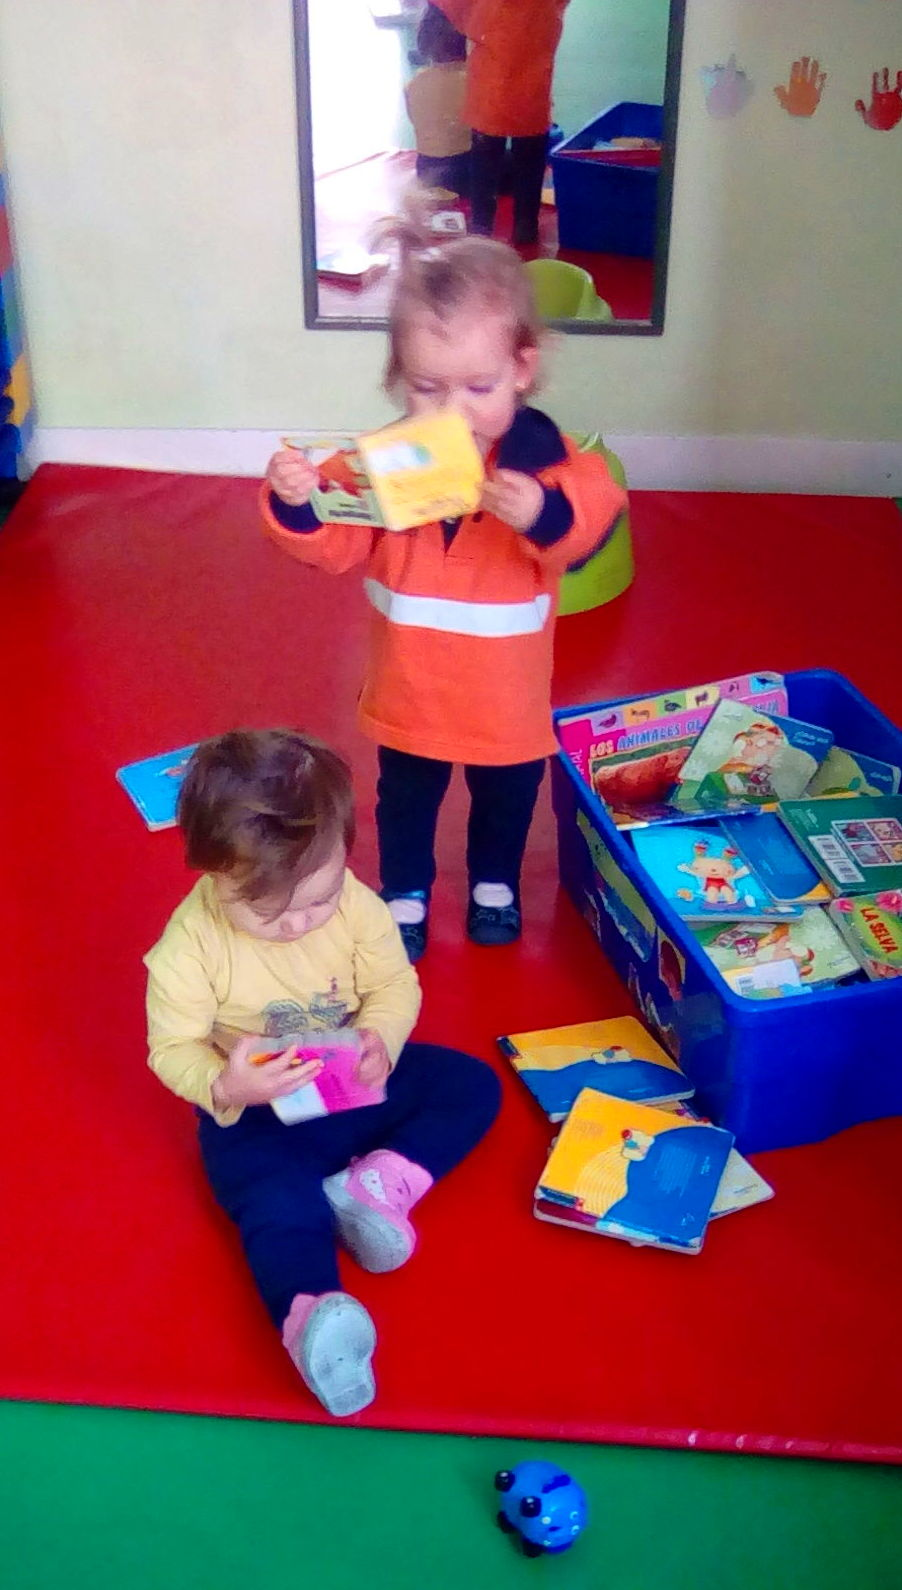 Foto 10 de Escuela infantil en Algete | E.I. Cuatro Pecas de Colores